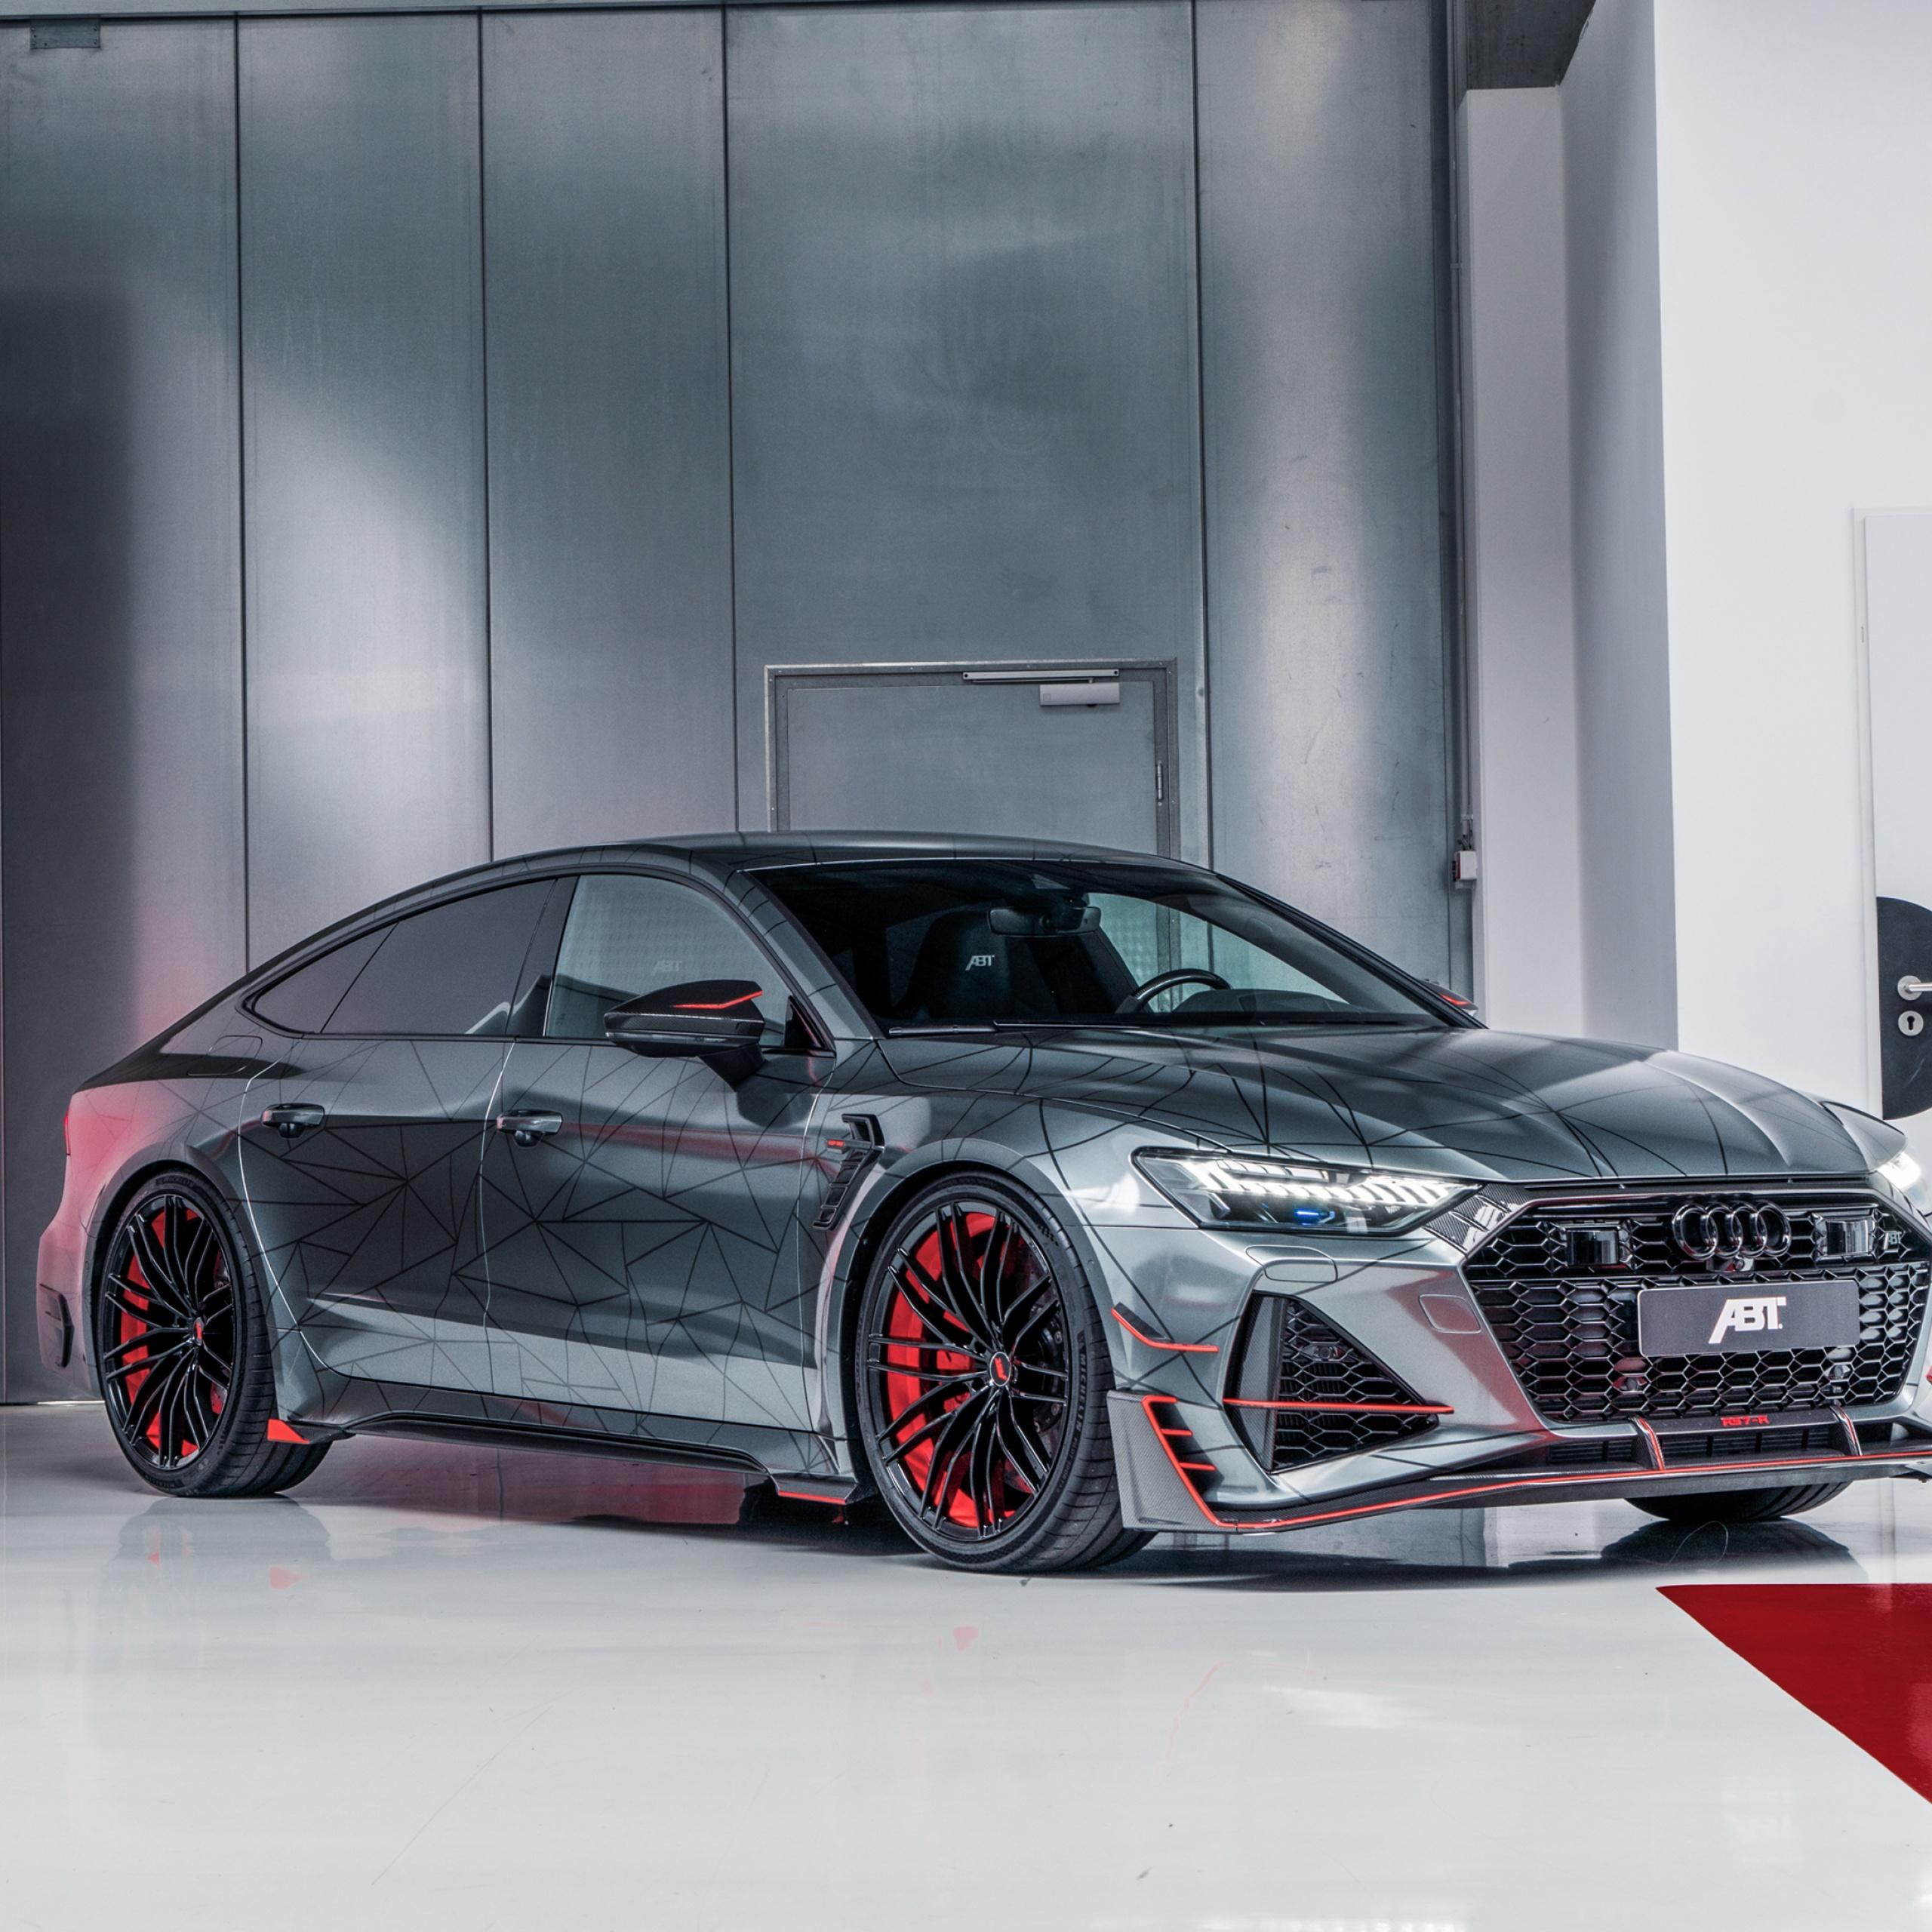 4K Wallpaper ABT Audi RS7-R, 2020, Cars, #222